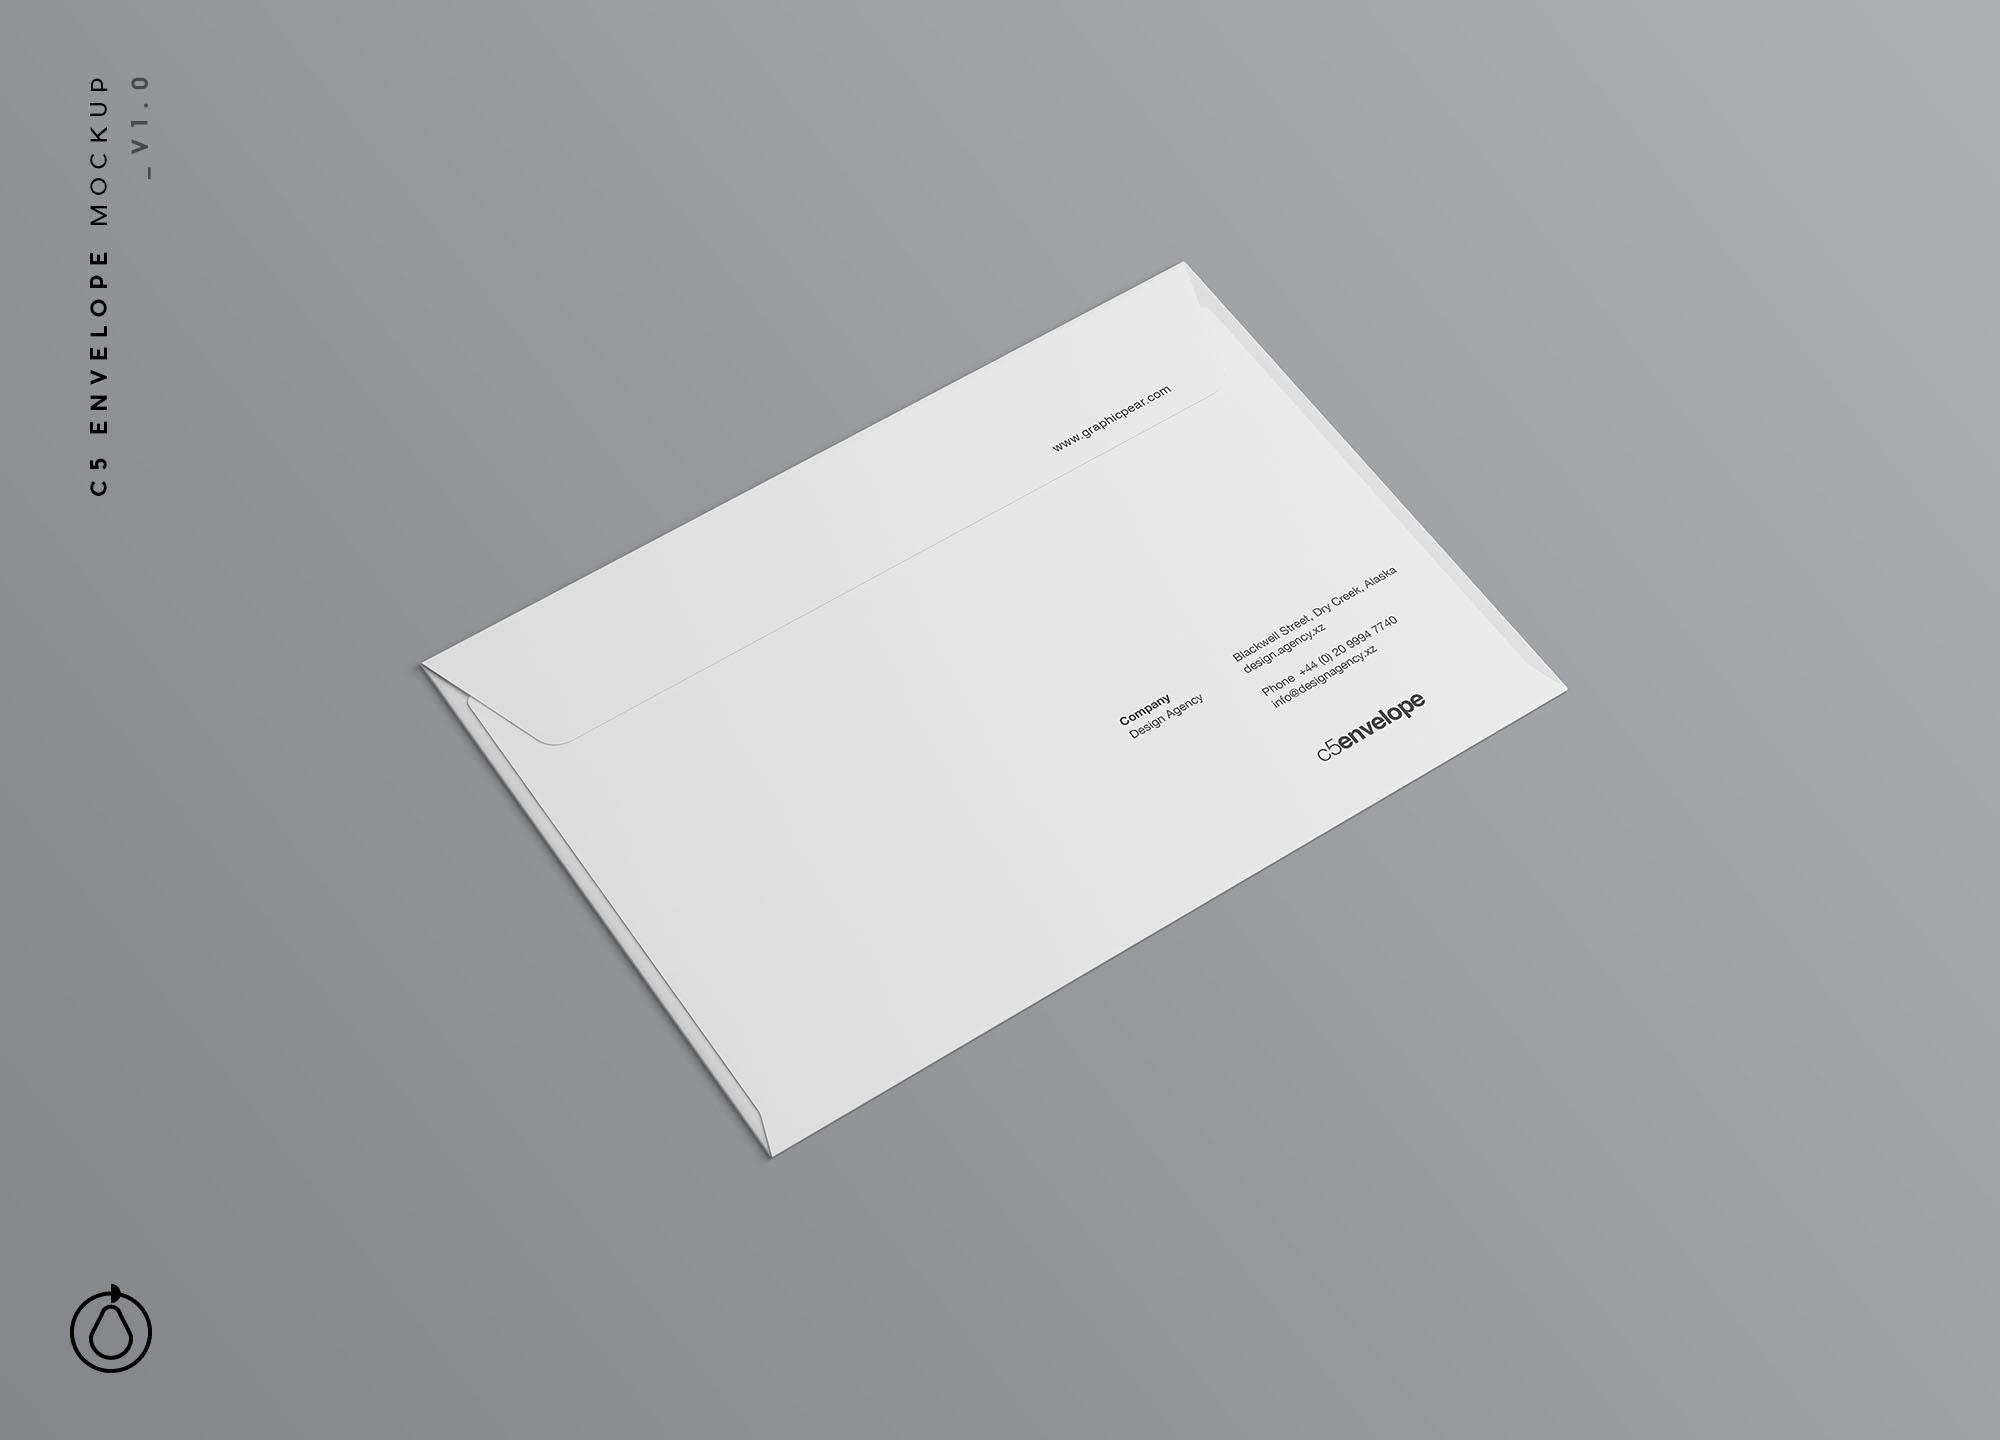 C5 Envelope Mockup PSD